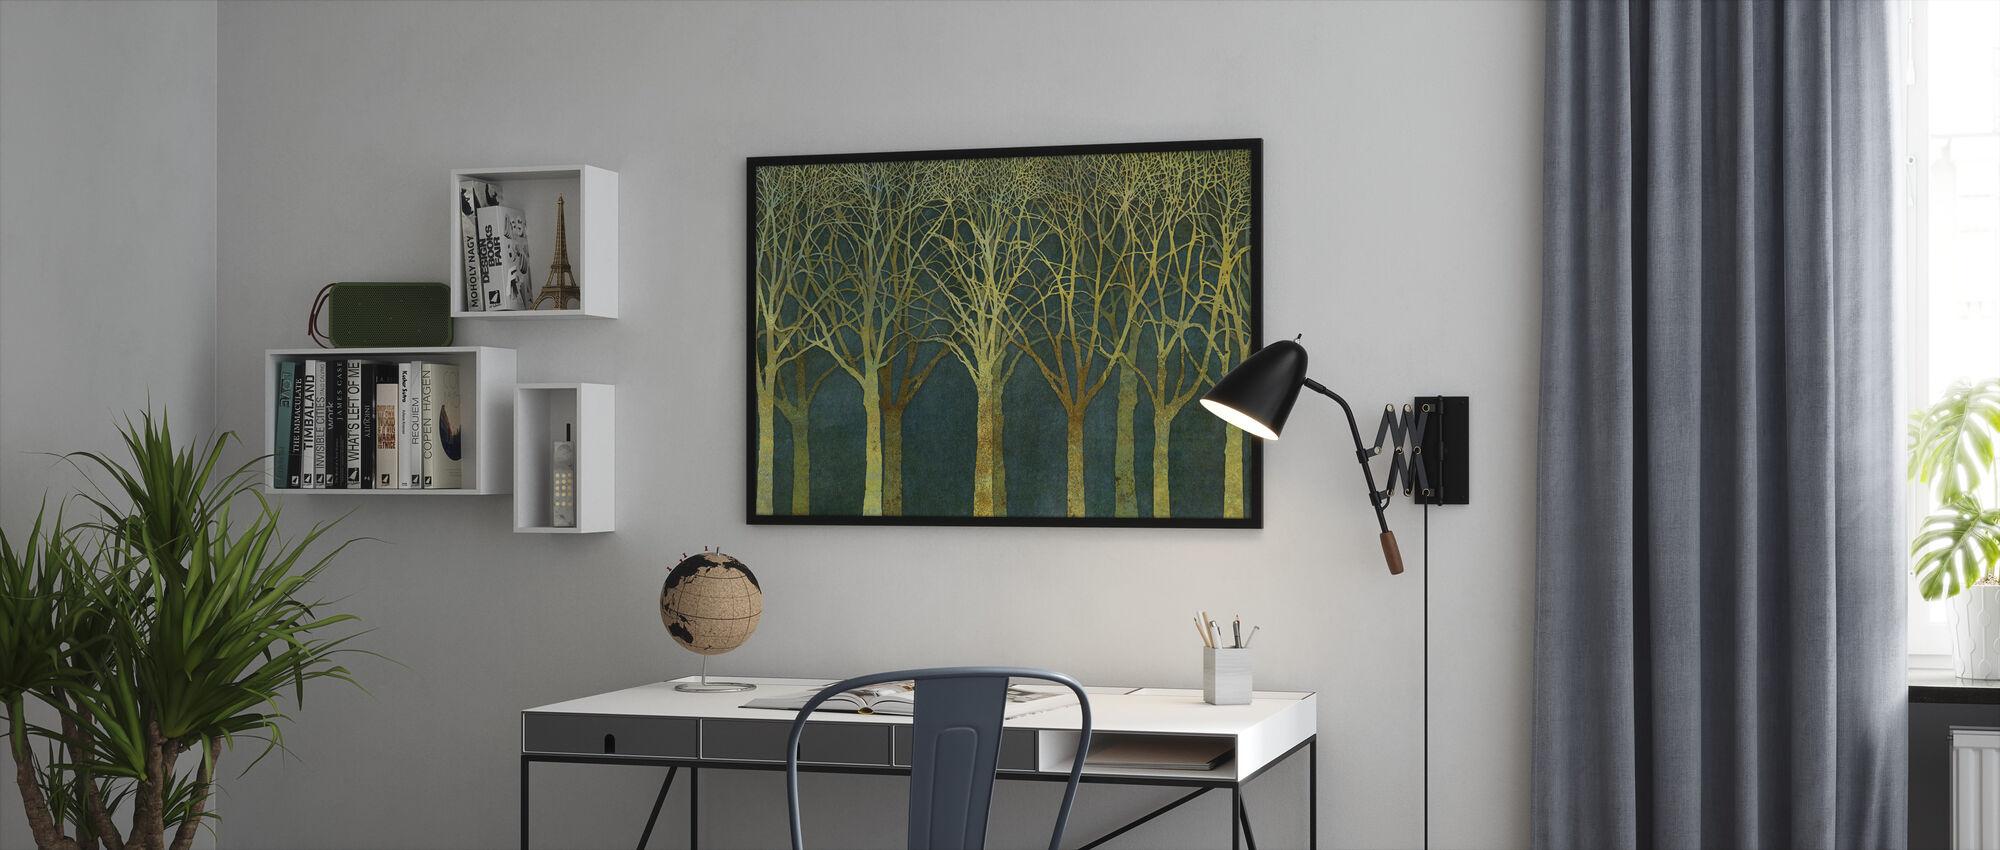 Birch Grove Golden Light - Framed print - Office